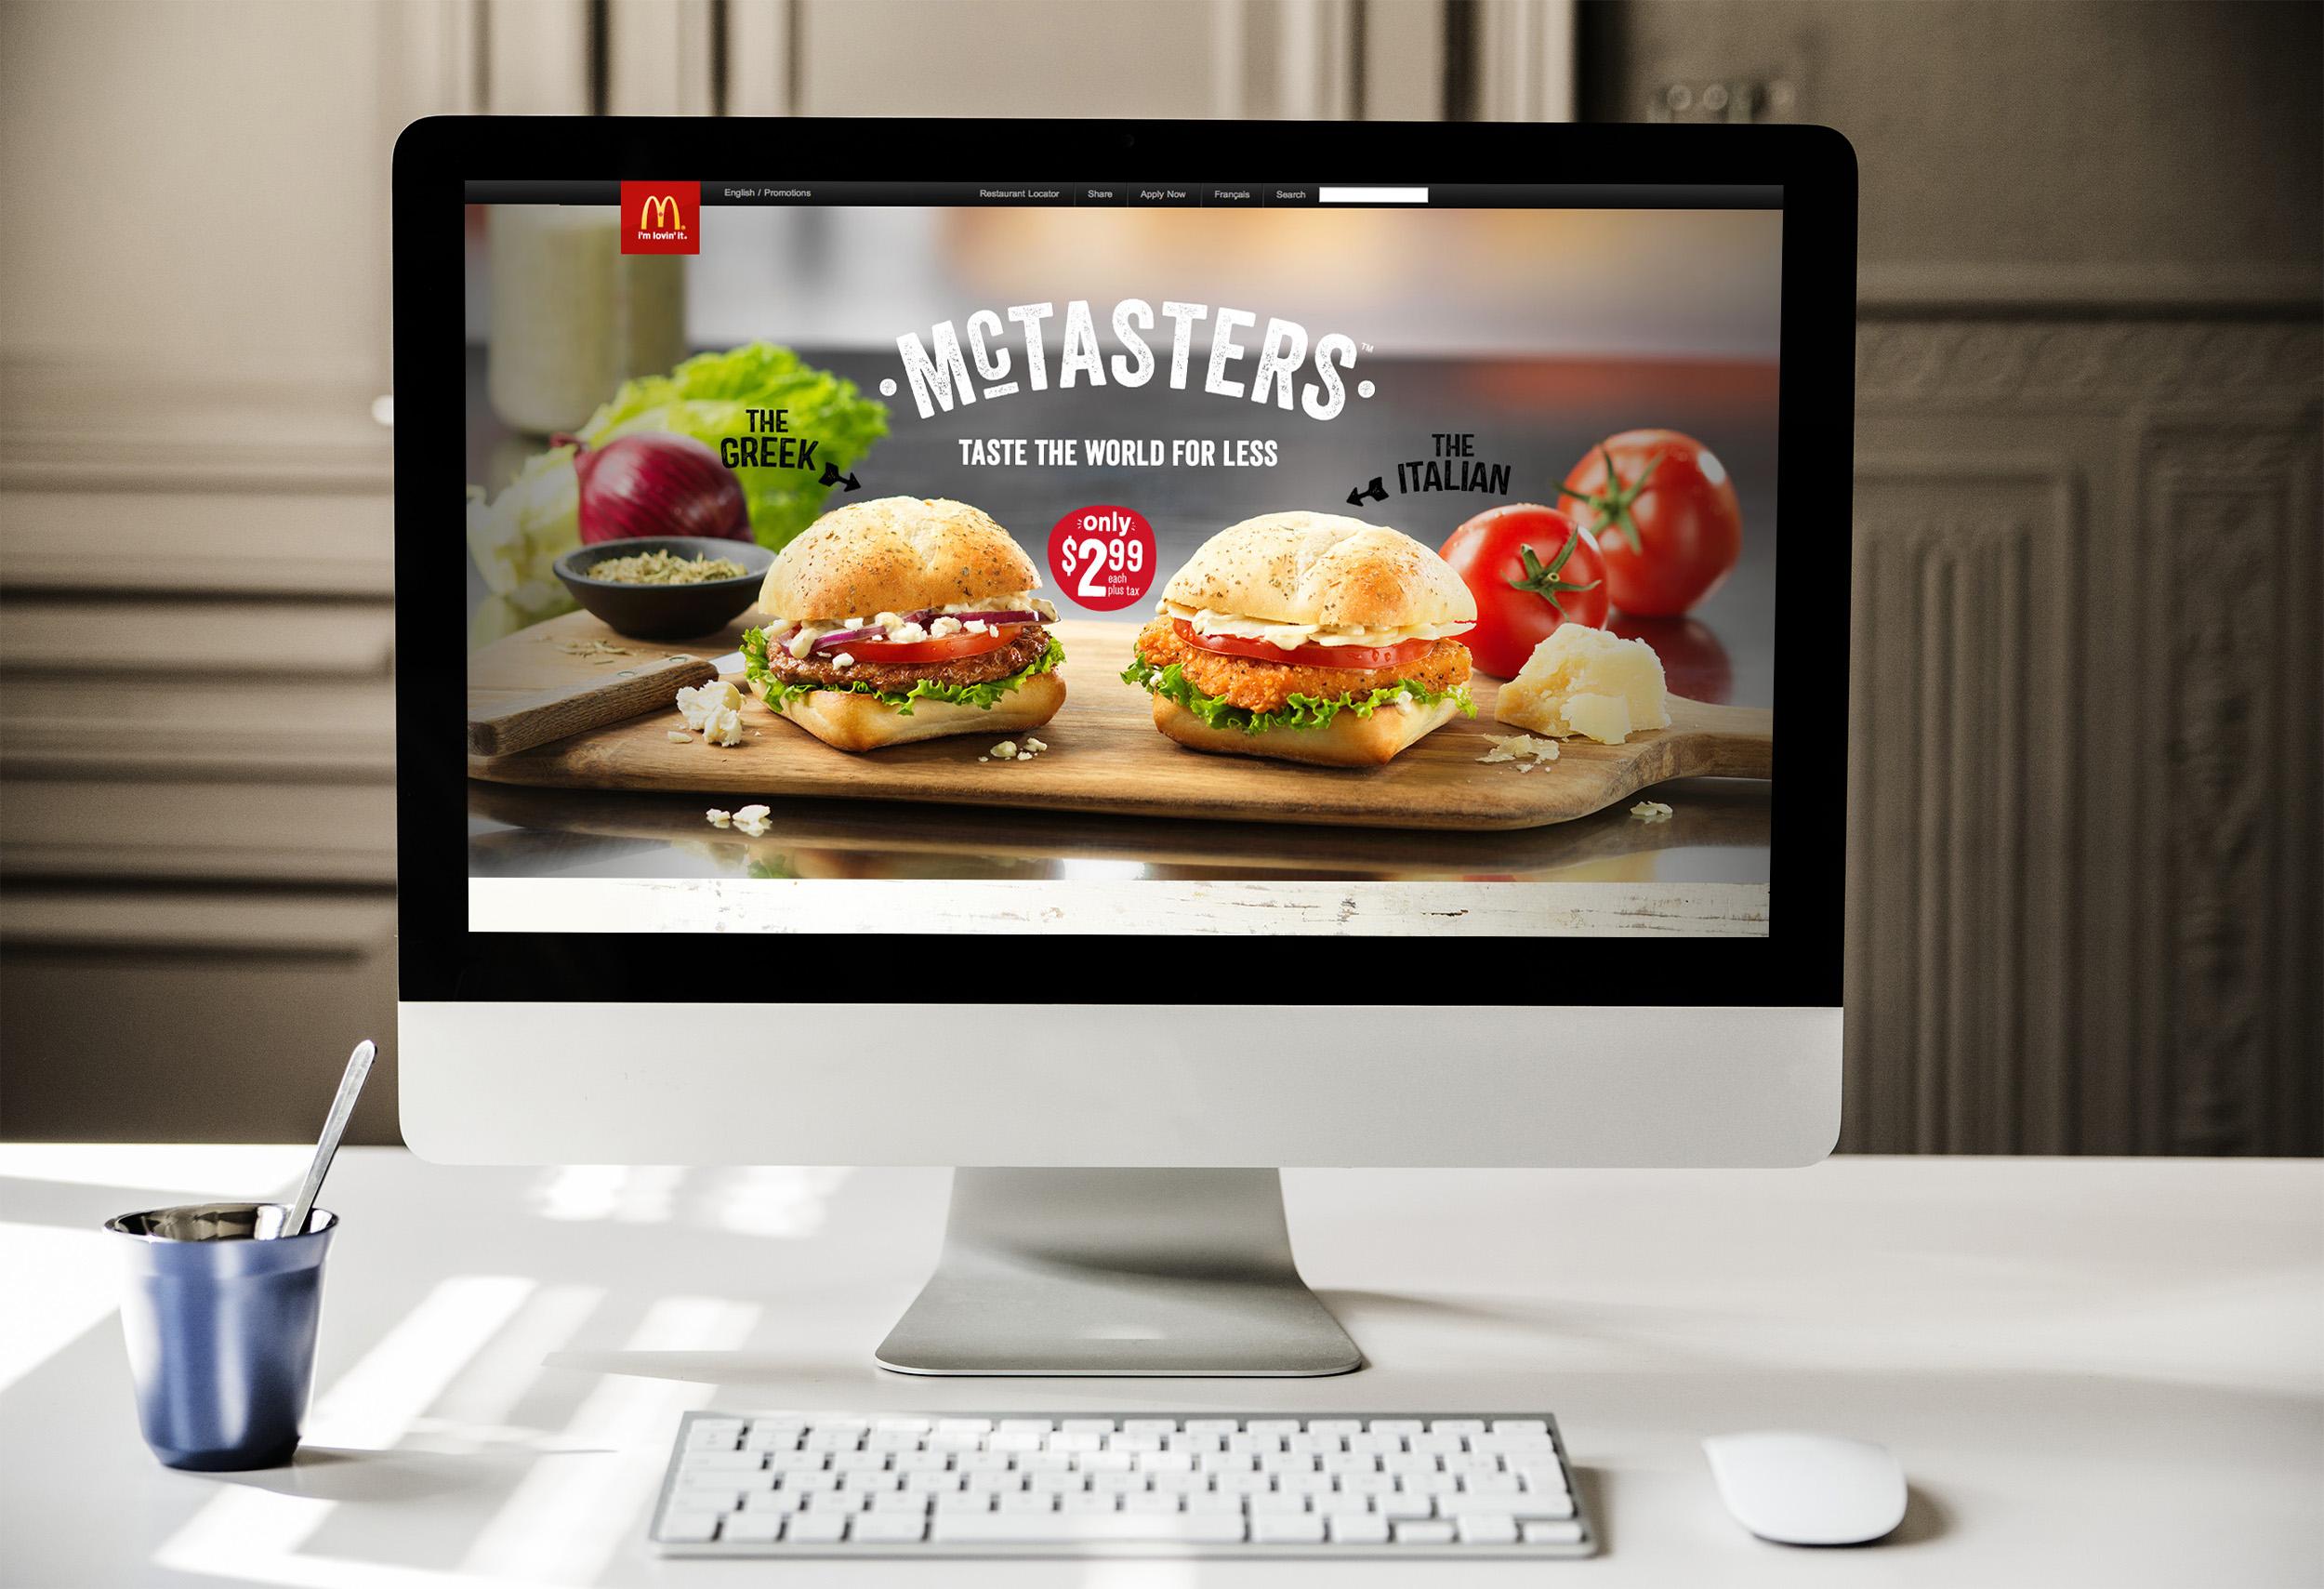 mctasters01